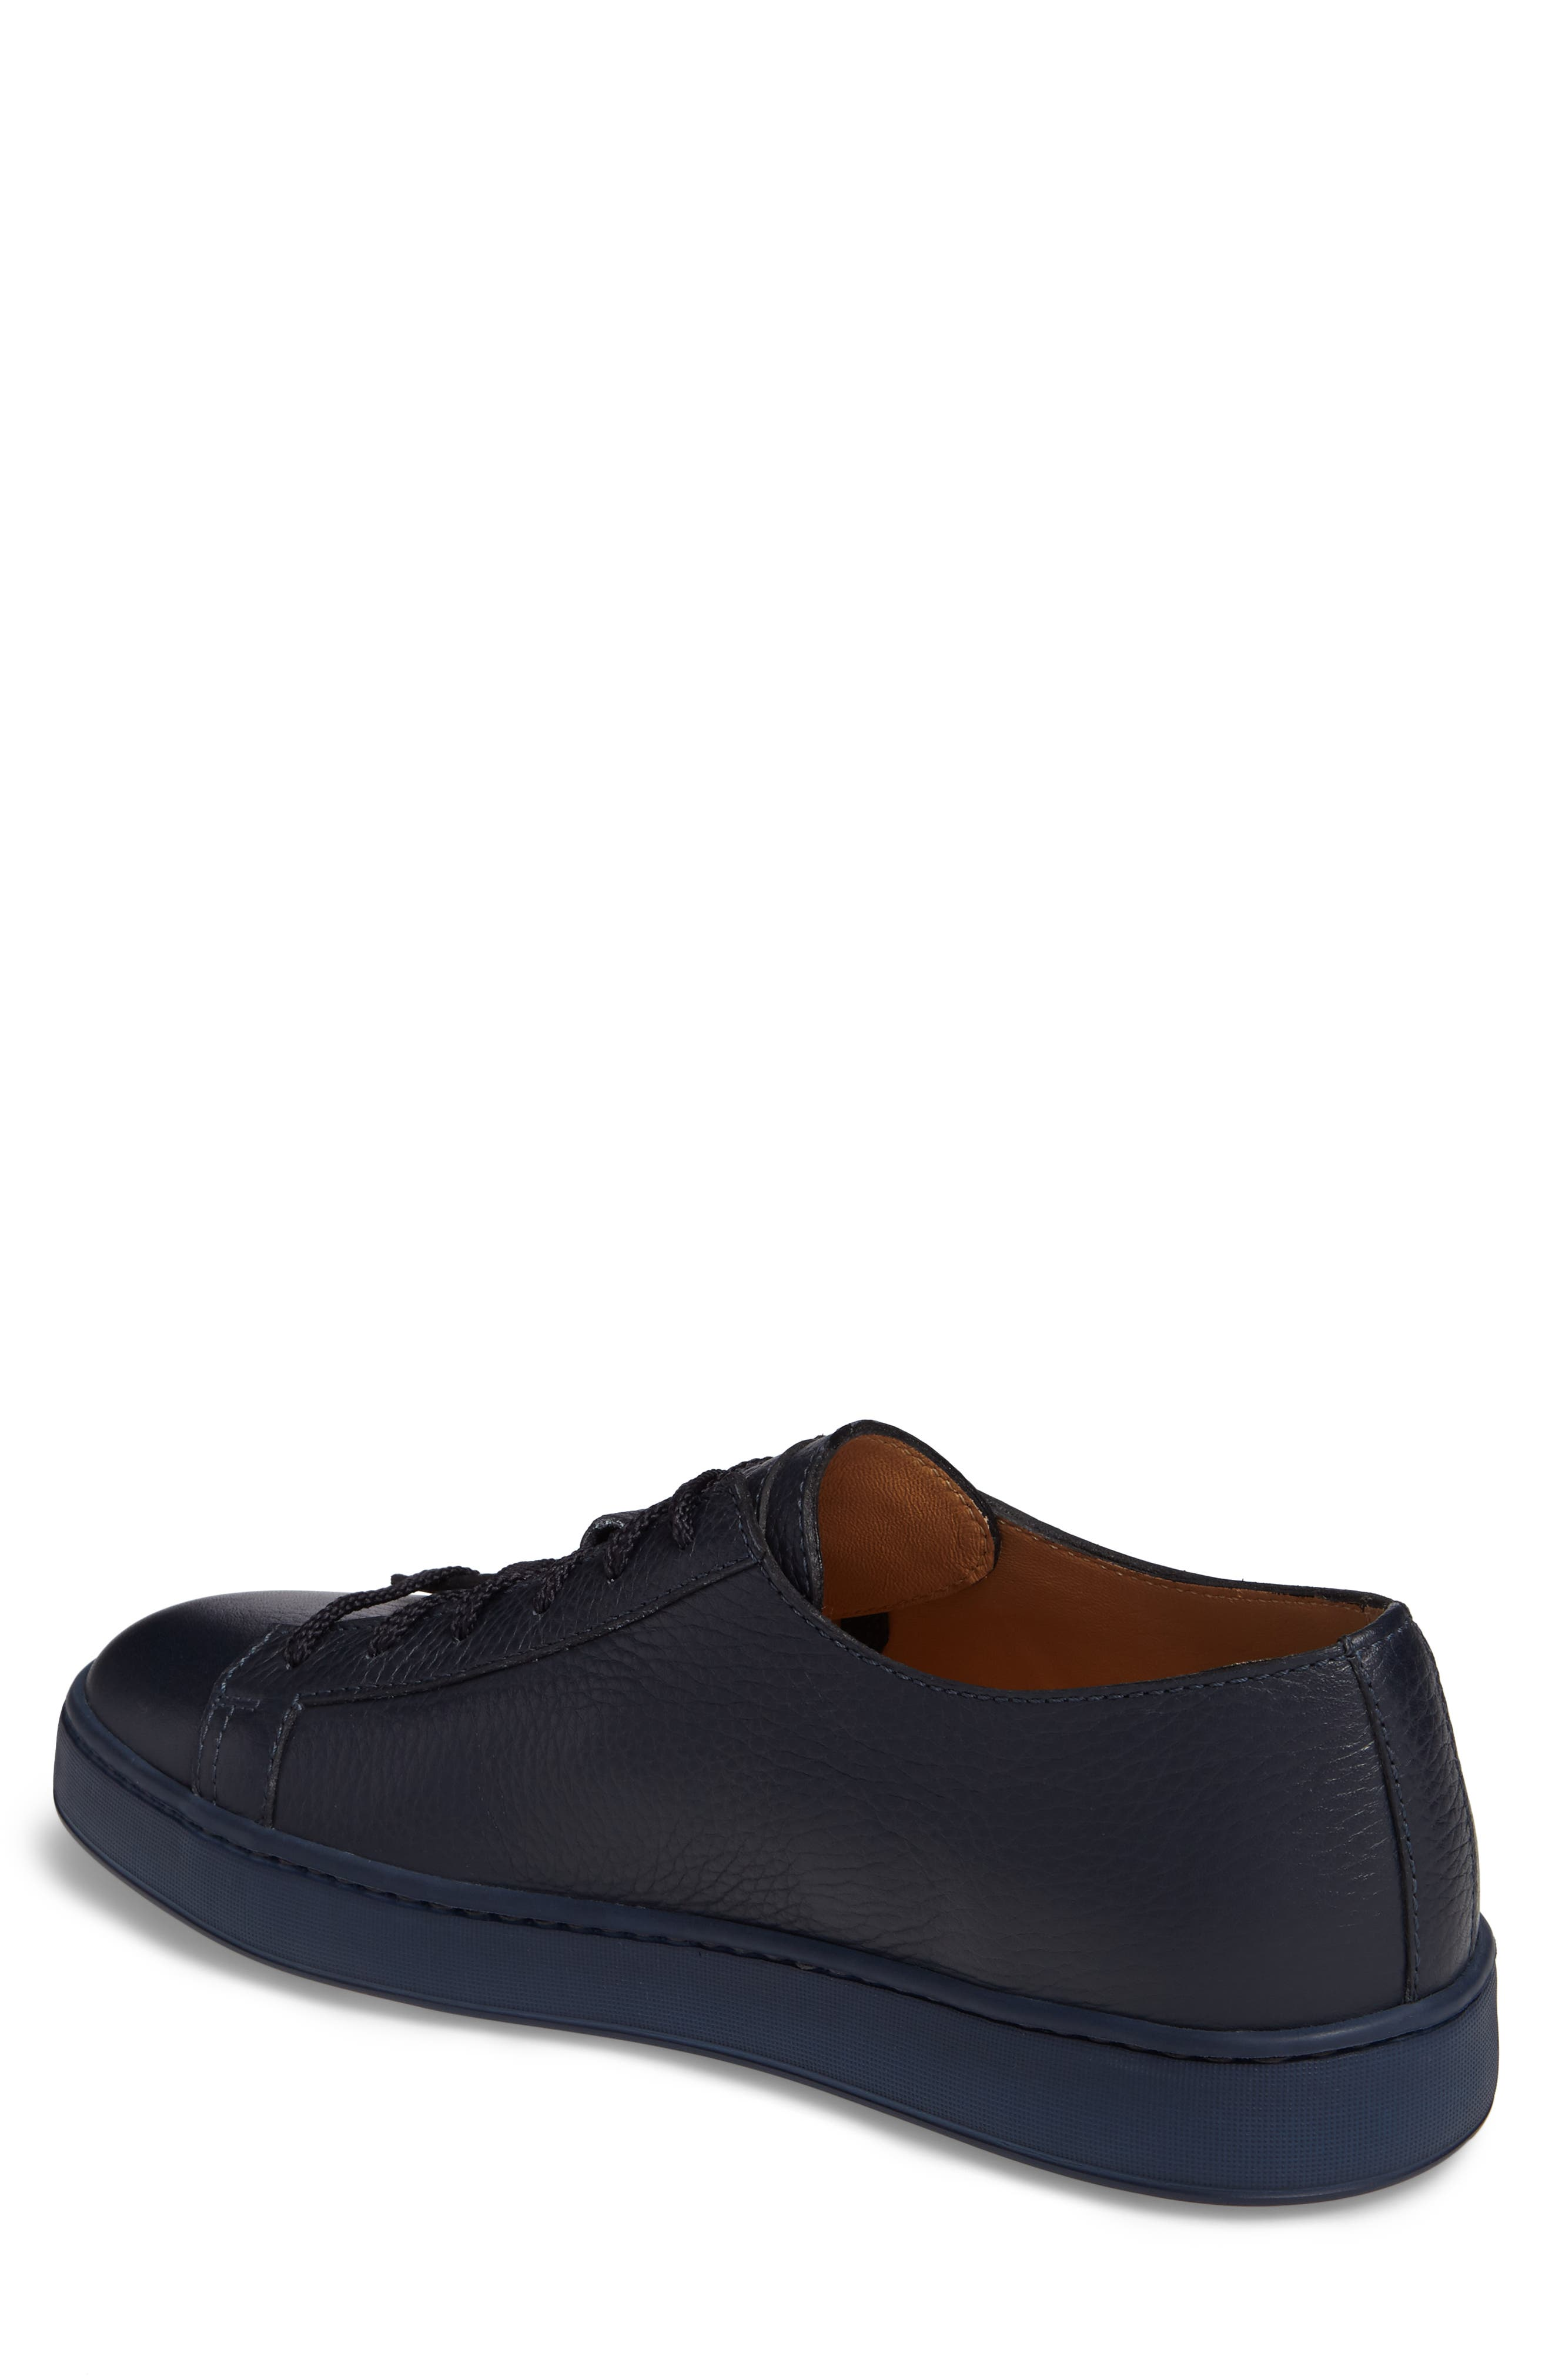 Cleanic Sneaker,                             Alternate thumbnail 8, color,